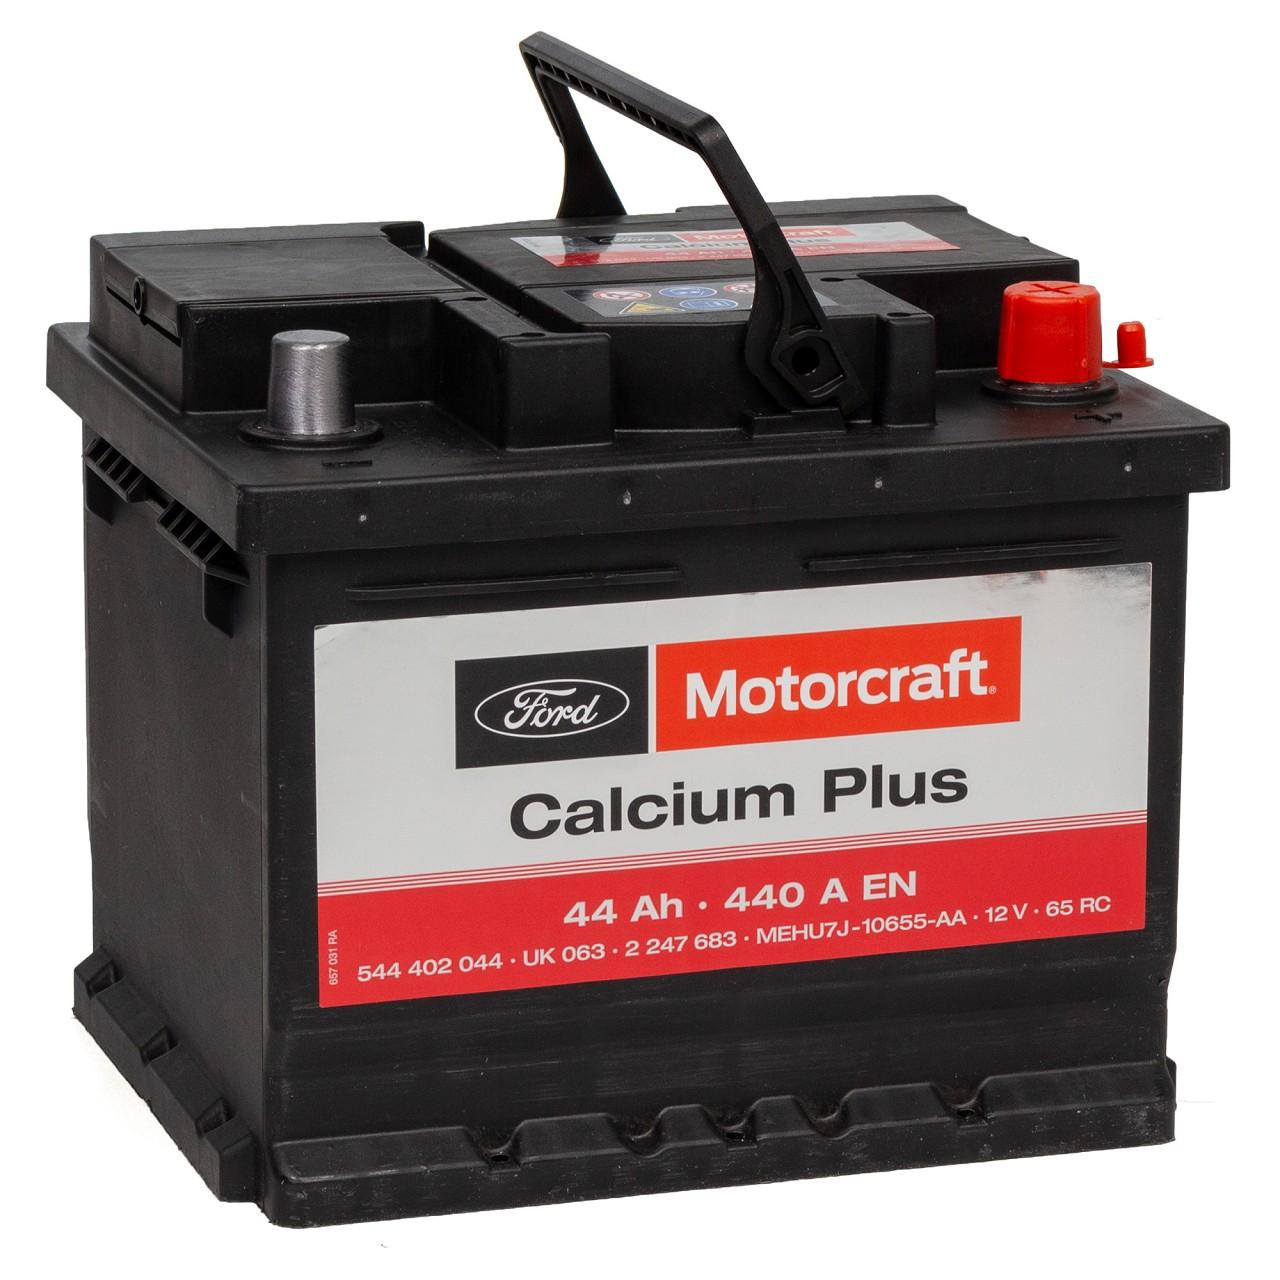 ORIGINAL Ford MOTORCRAFT Autobatterie Batterie Starterbatterie 12V 44Ah 2247683